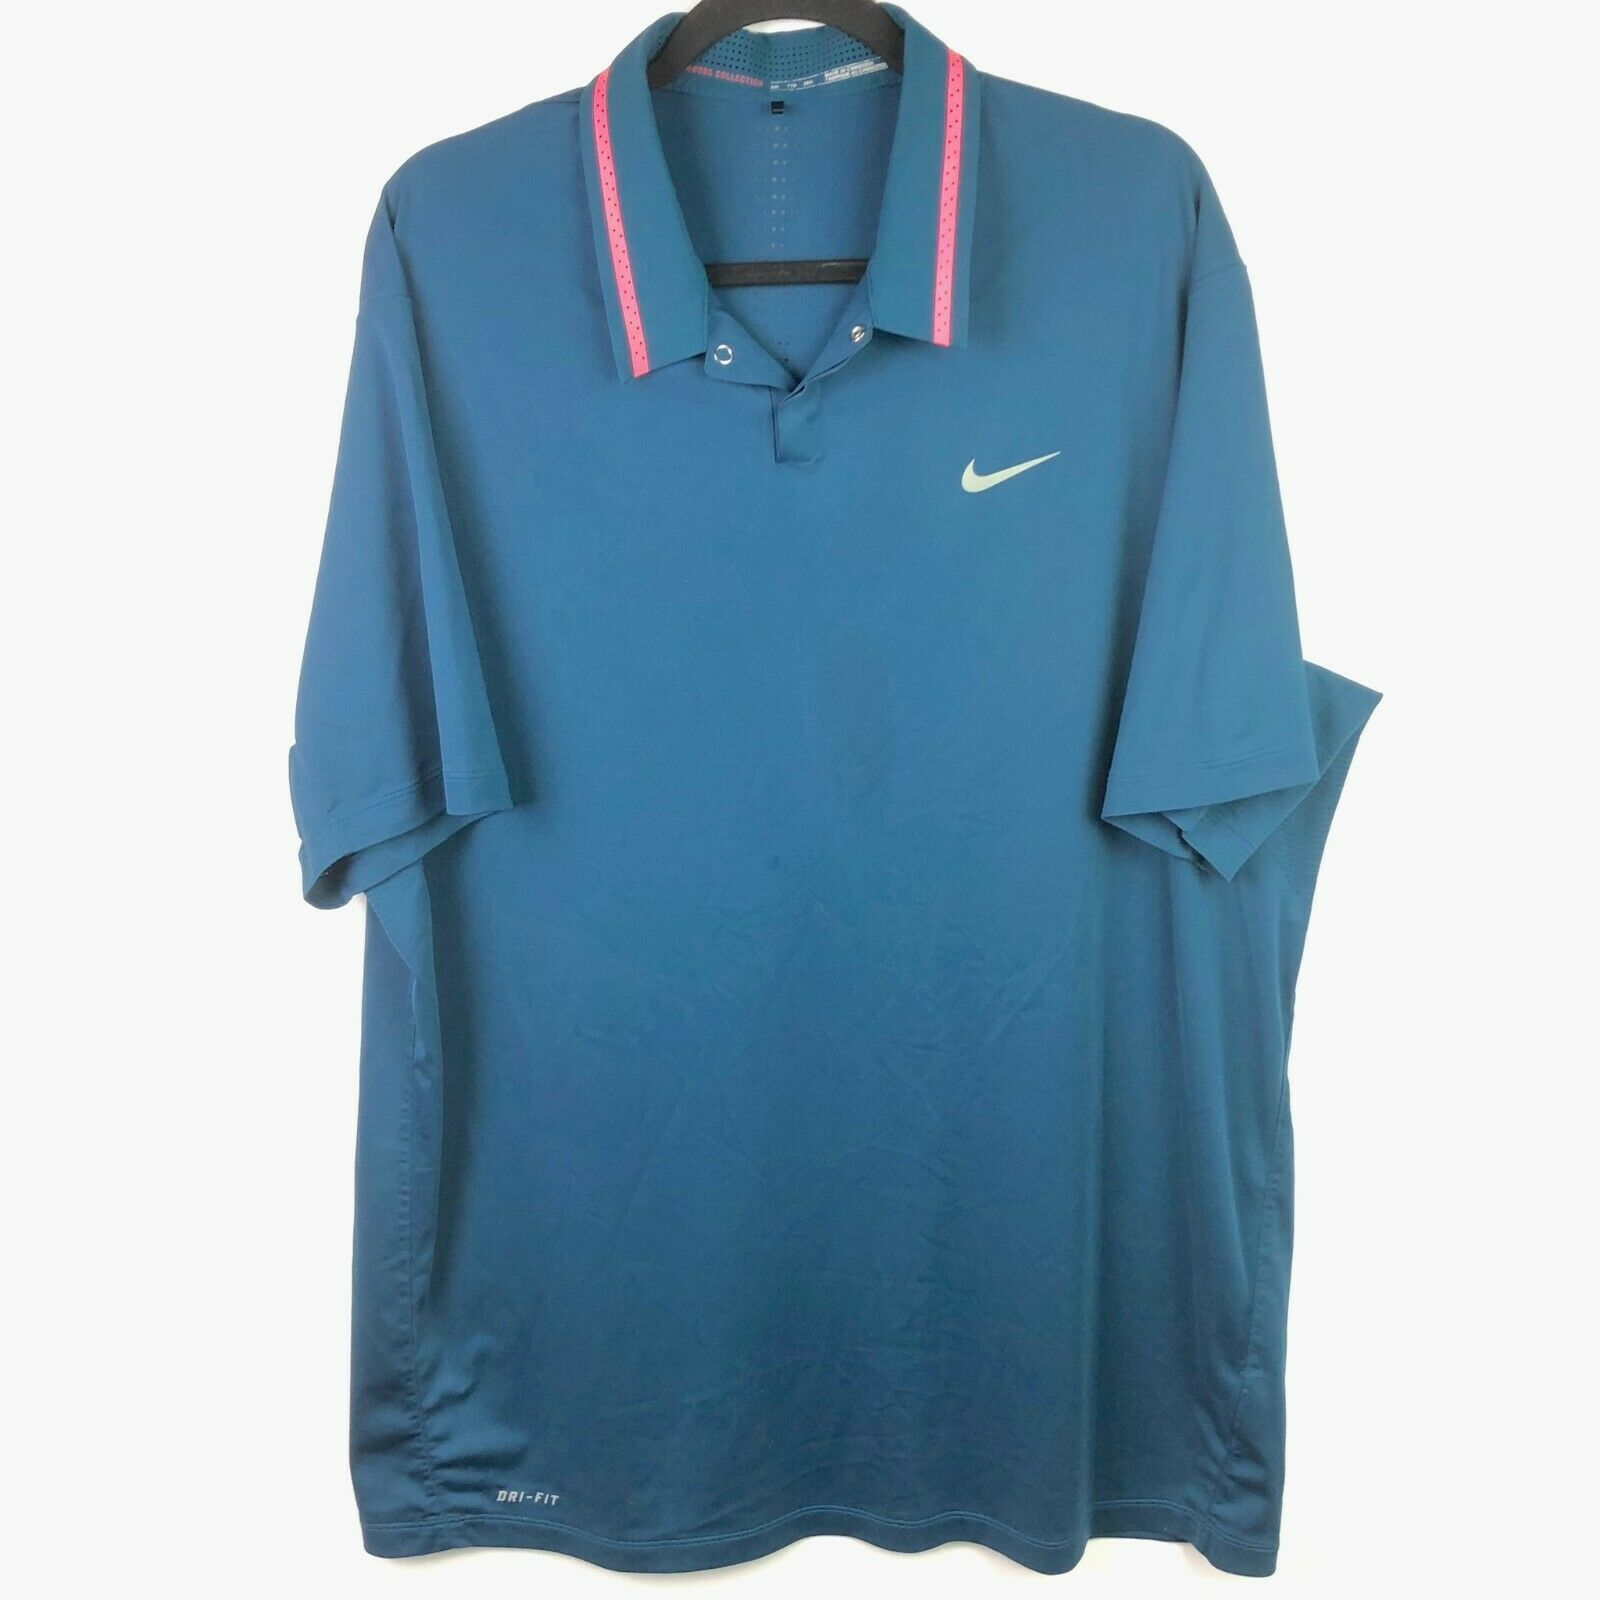 Nike Golf Tiger Woods TW Ultra 3.0 Dri-fit Polo Size XXL Space Blue 619757 483 - $37.62